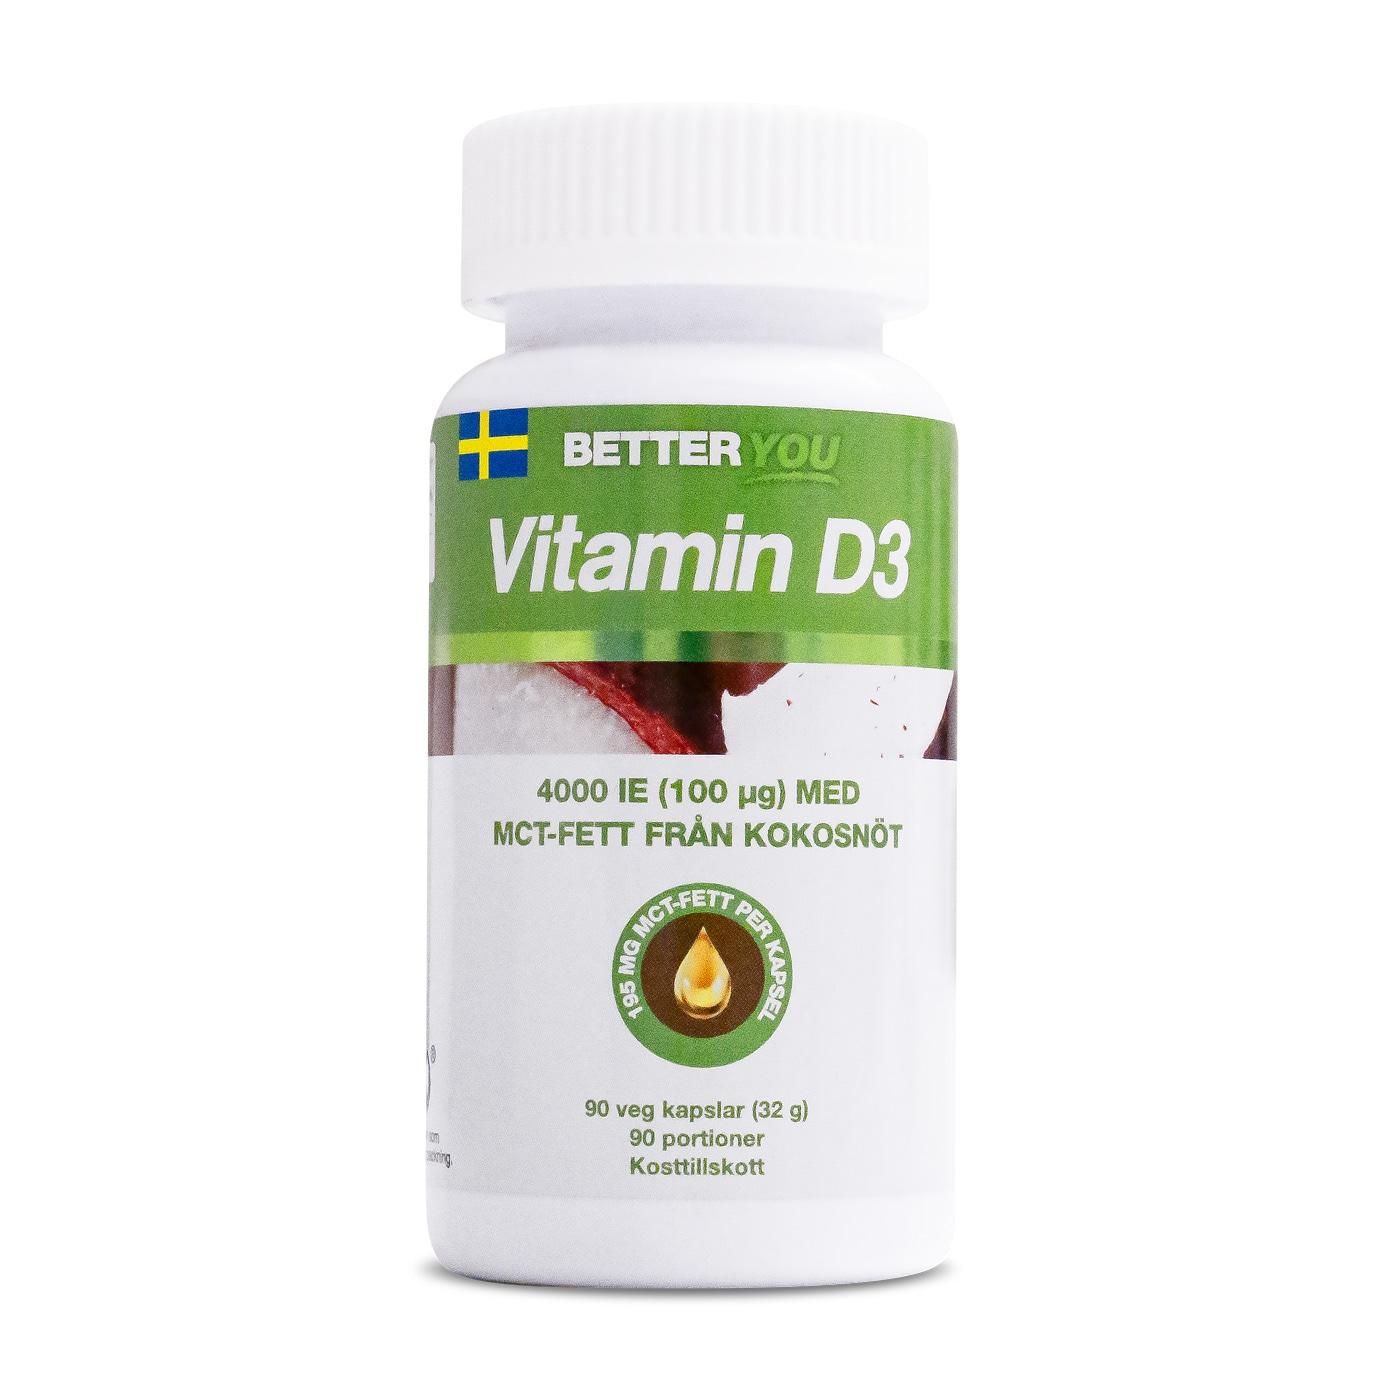 Vitamin D3 4000 IE + MCT-FETT